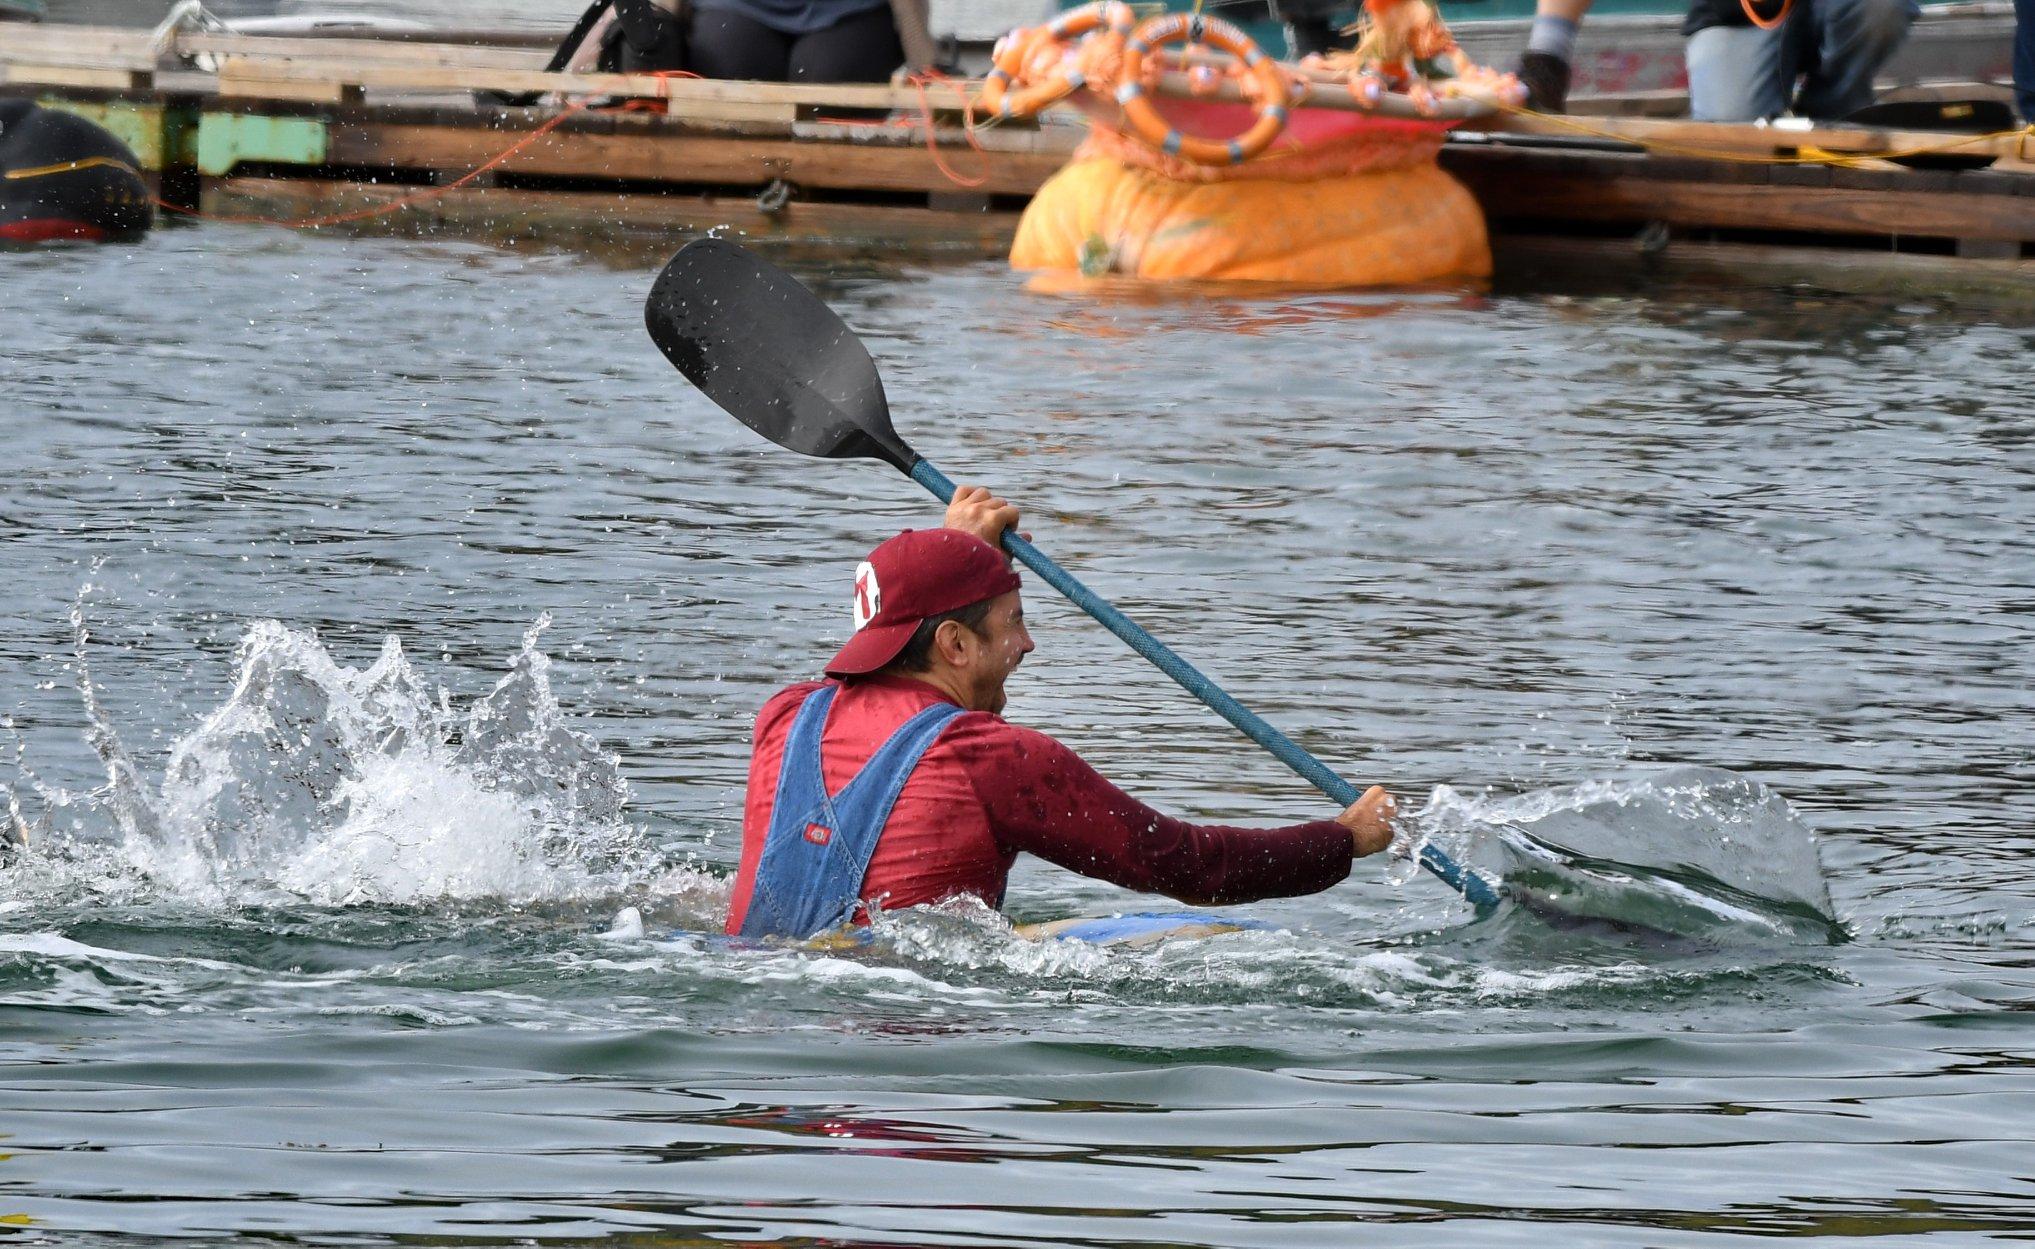 Damariscotta Pumpkin Boat Regatta